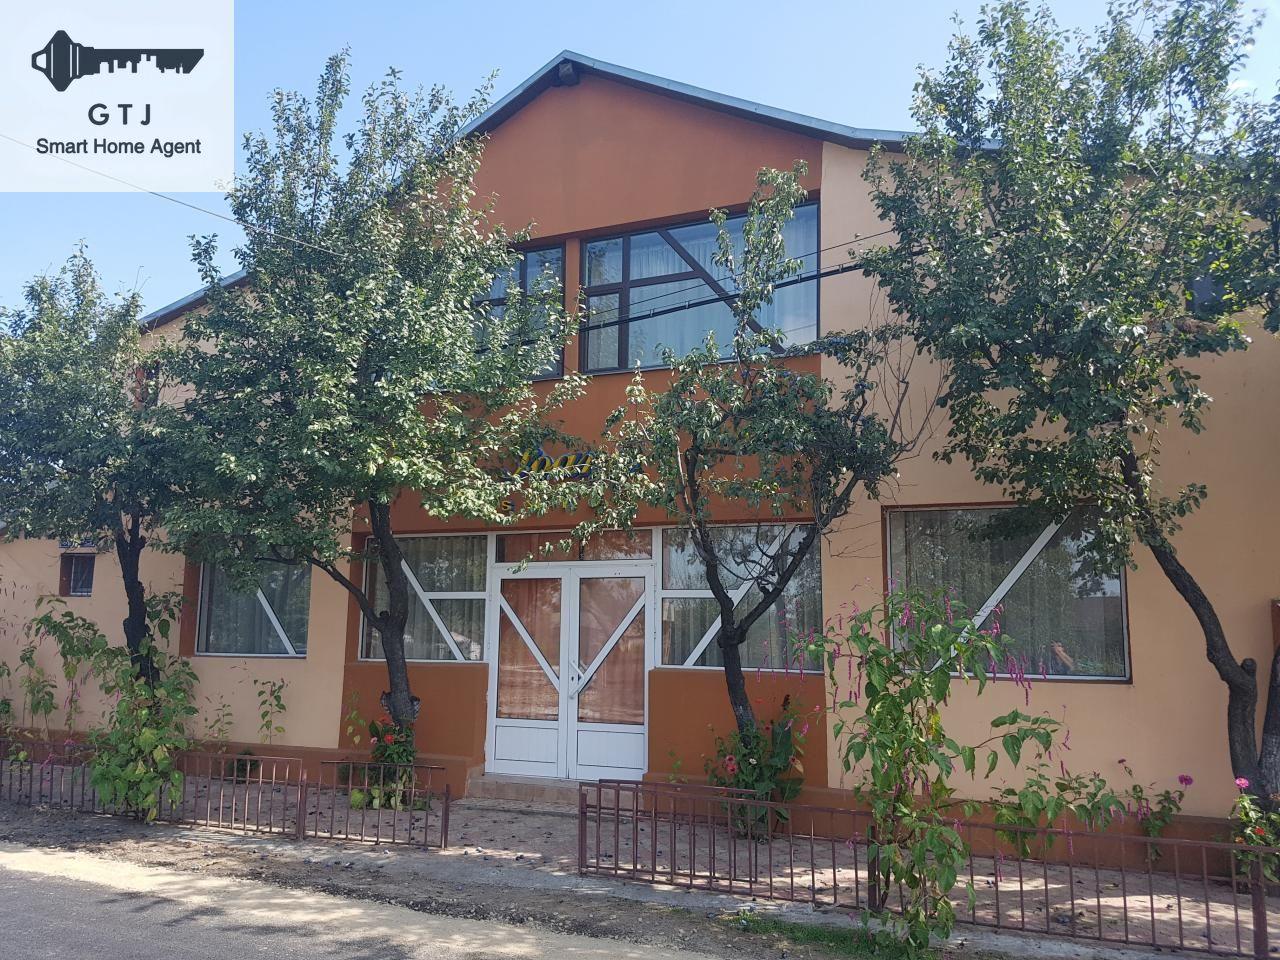 Casa de vanzare, Vrancea (judet), Vânători - Foto 1